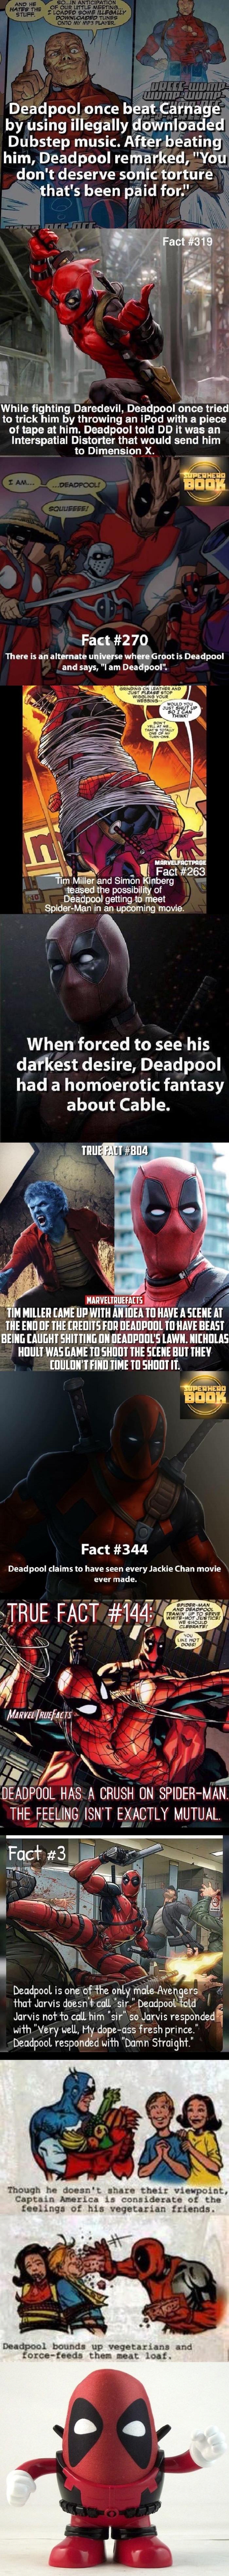 Fun Deadpool facts